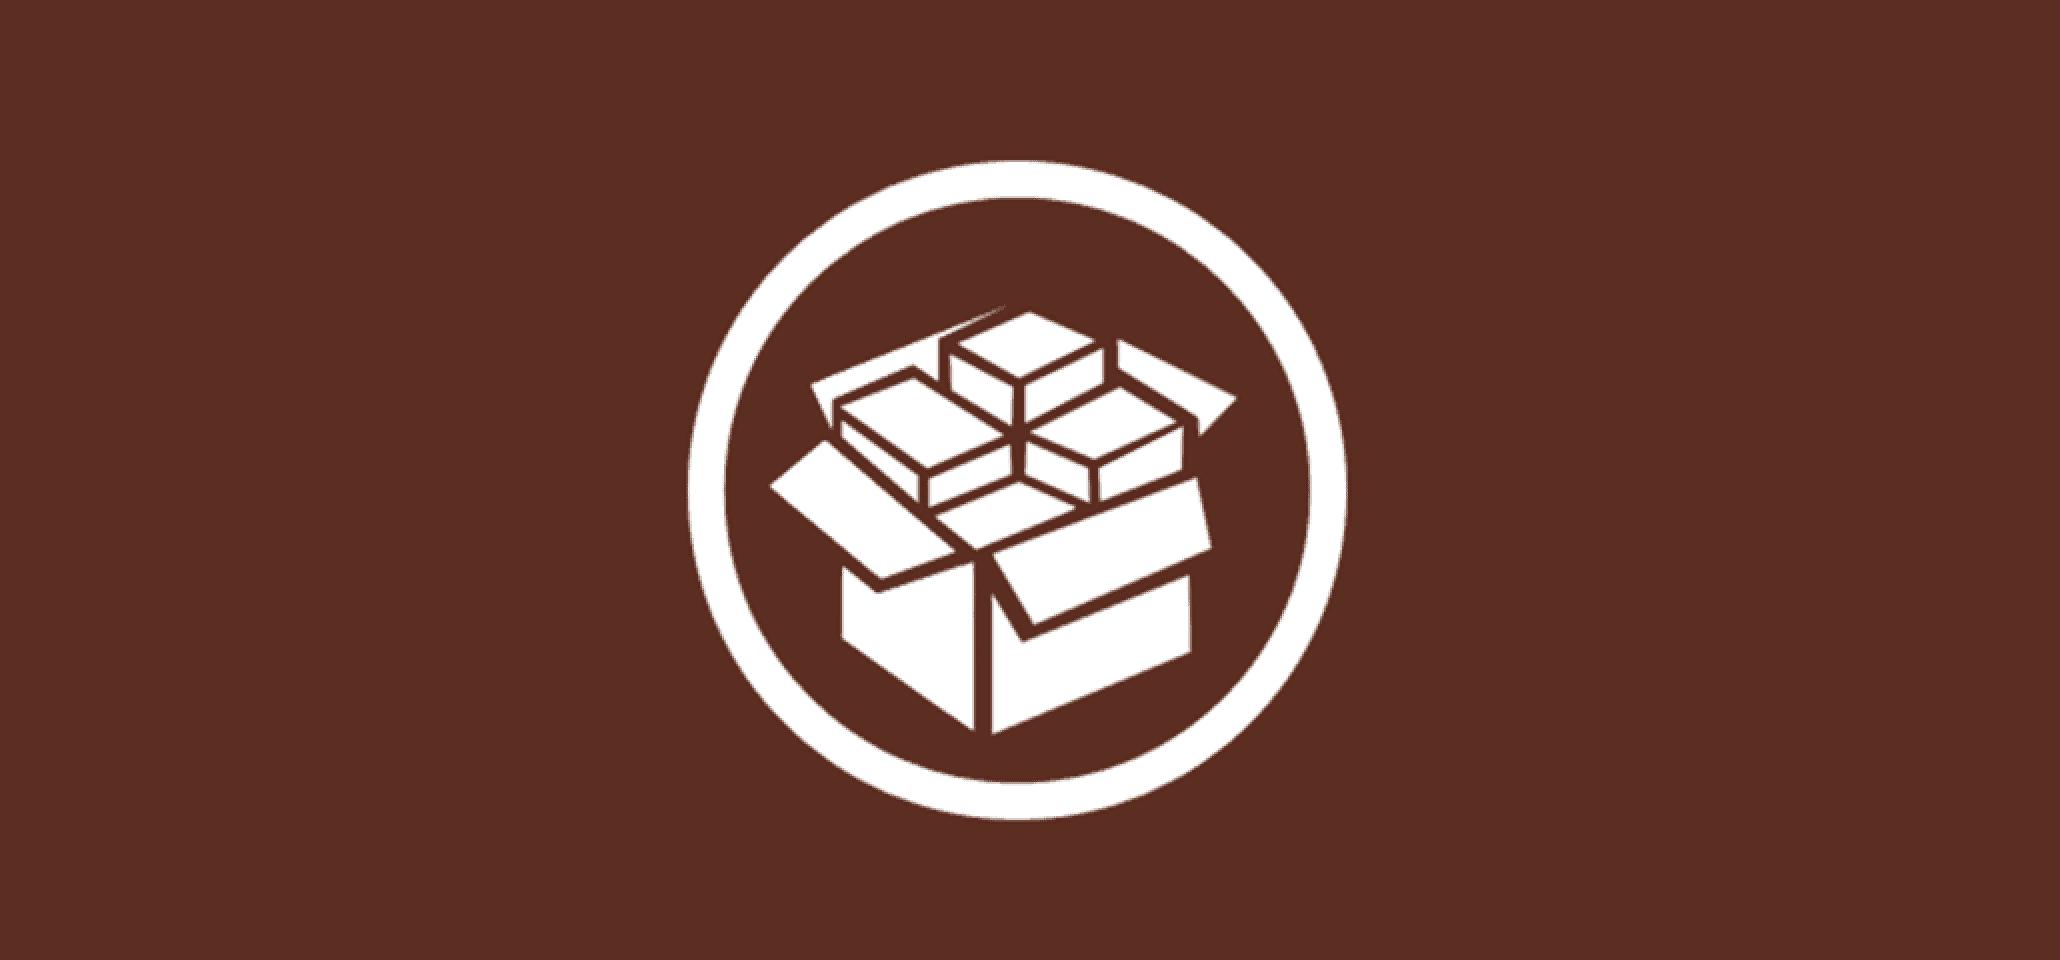 6 Best Cydia Alternatives for iOS - Techzillo